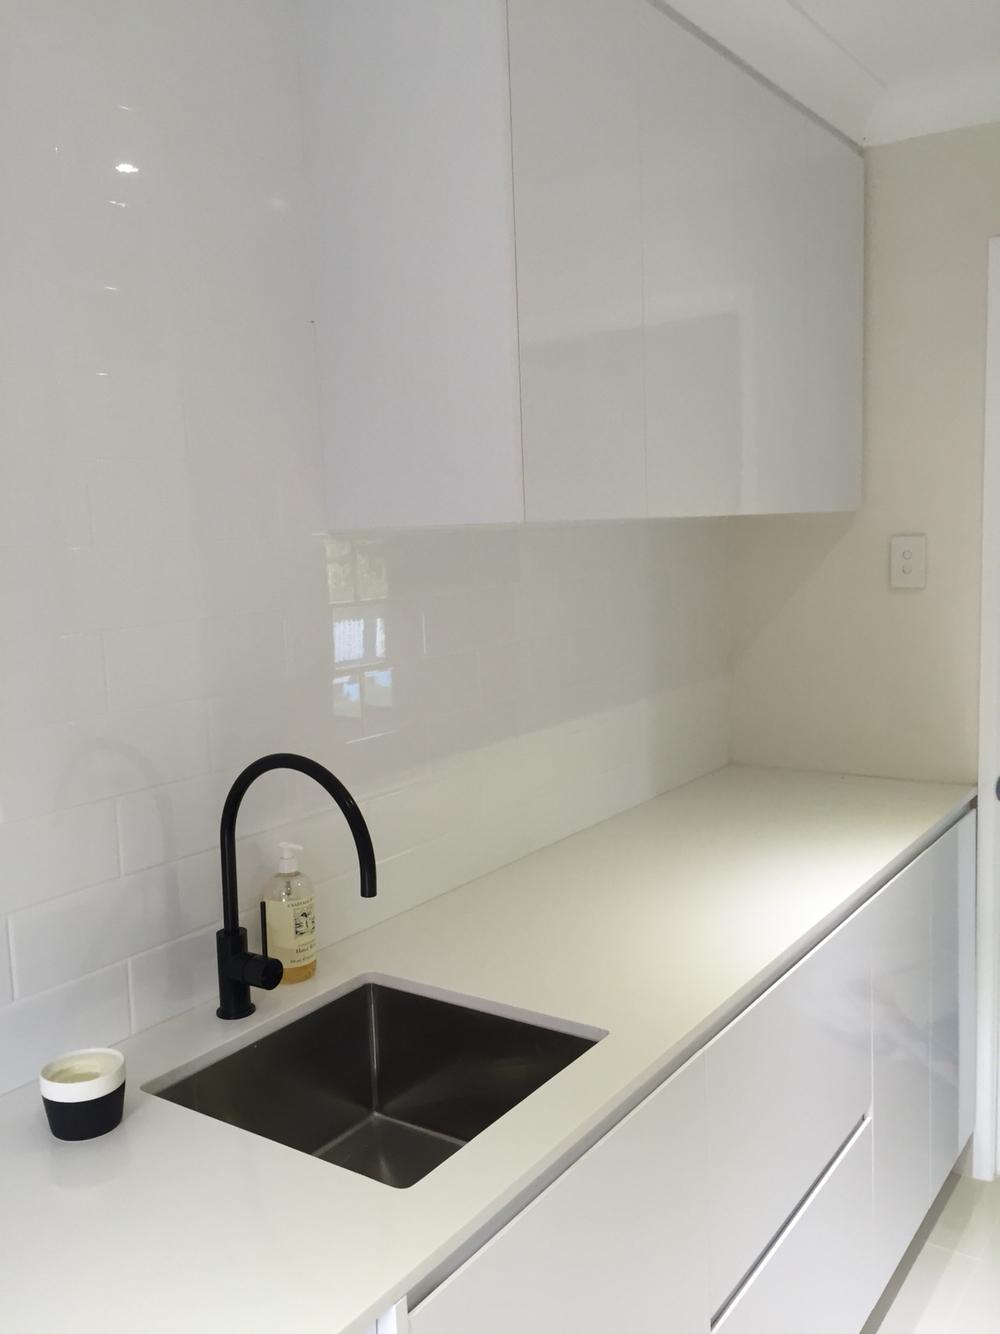 Laundry Renovations Perth Advice Bathroom Renovations Perth